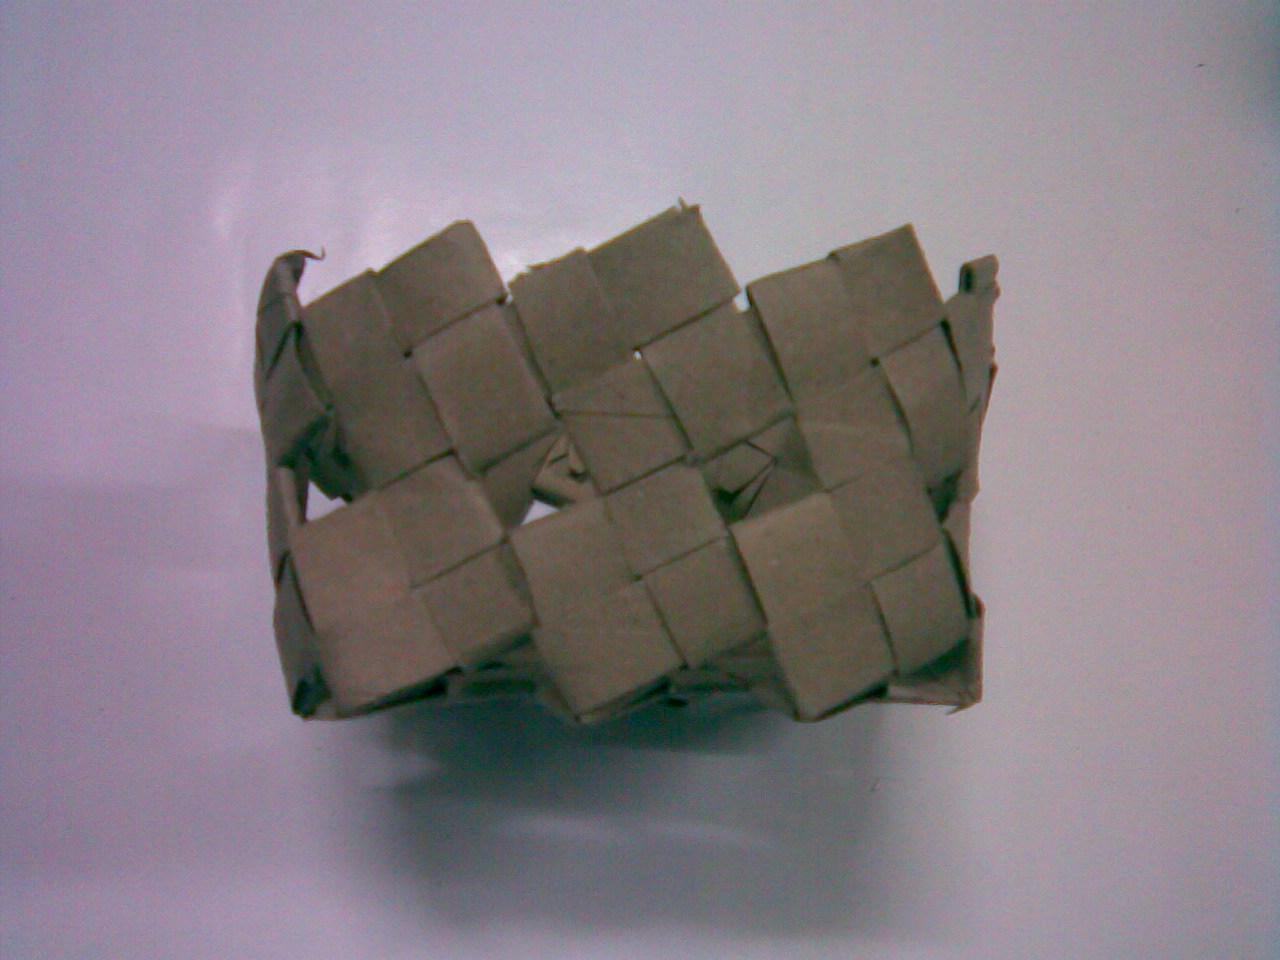 reuse milk carton how to no sew no glue bag from tetra pack juice box  hergebruiken melkpak hoe je geen naaien geen lijm tas van tetra pak sapdoos     återanvända mjölkpaket hur ingen att sy inget lim väska från tetra pack juice box REUSE, milk carton